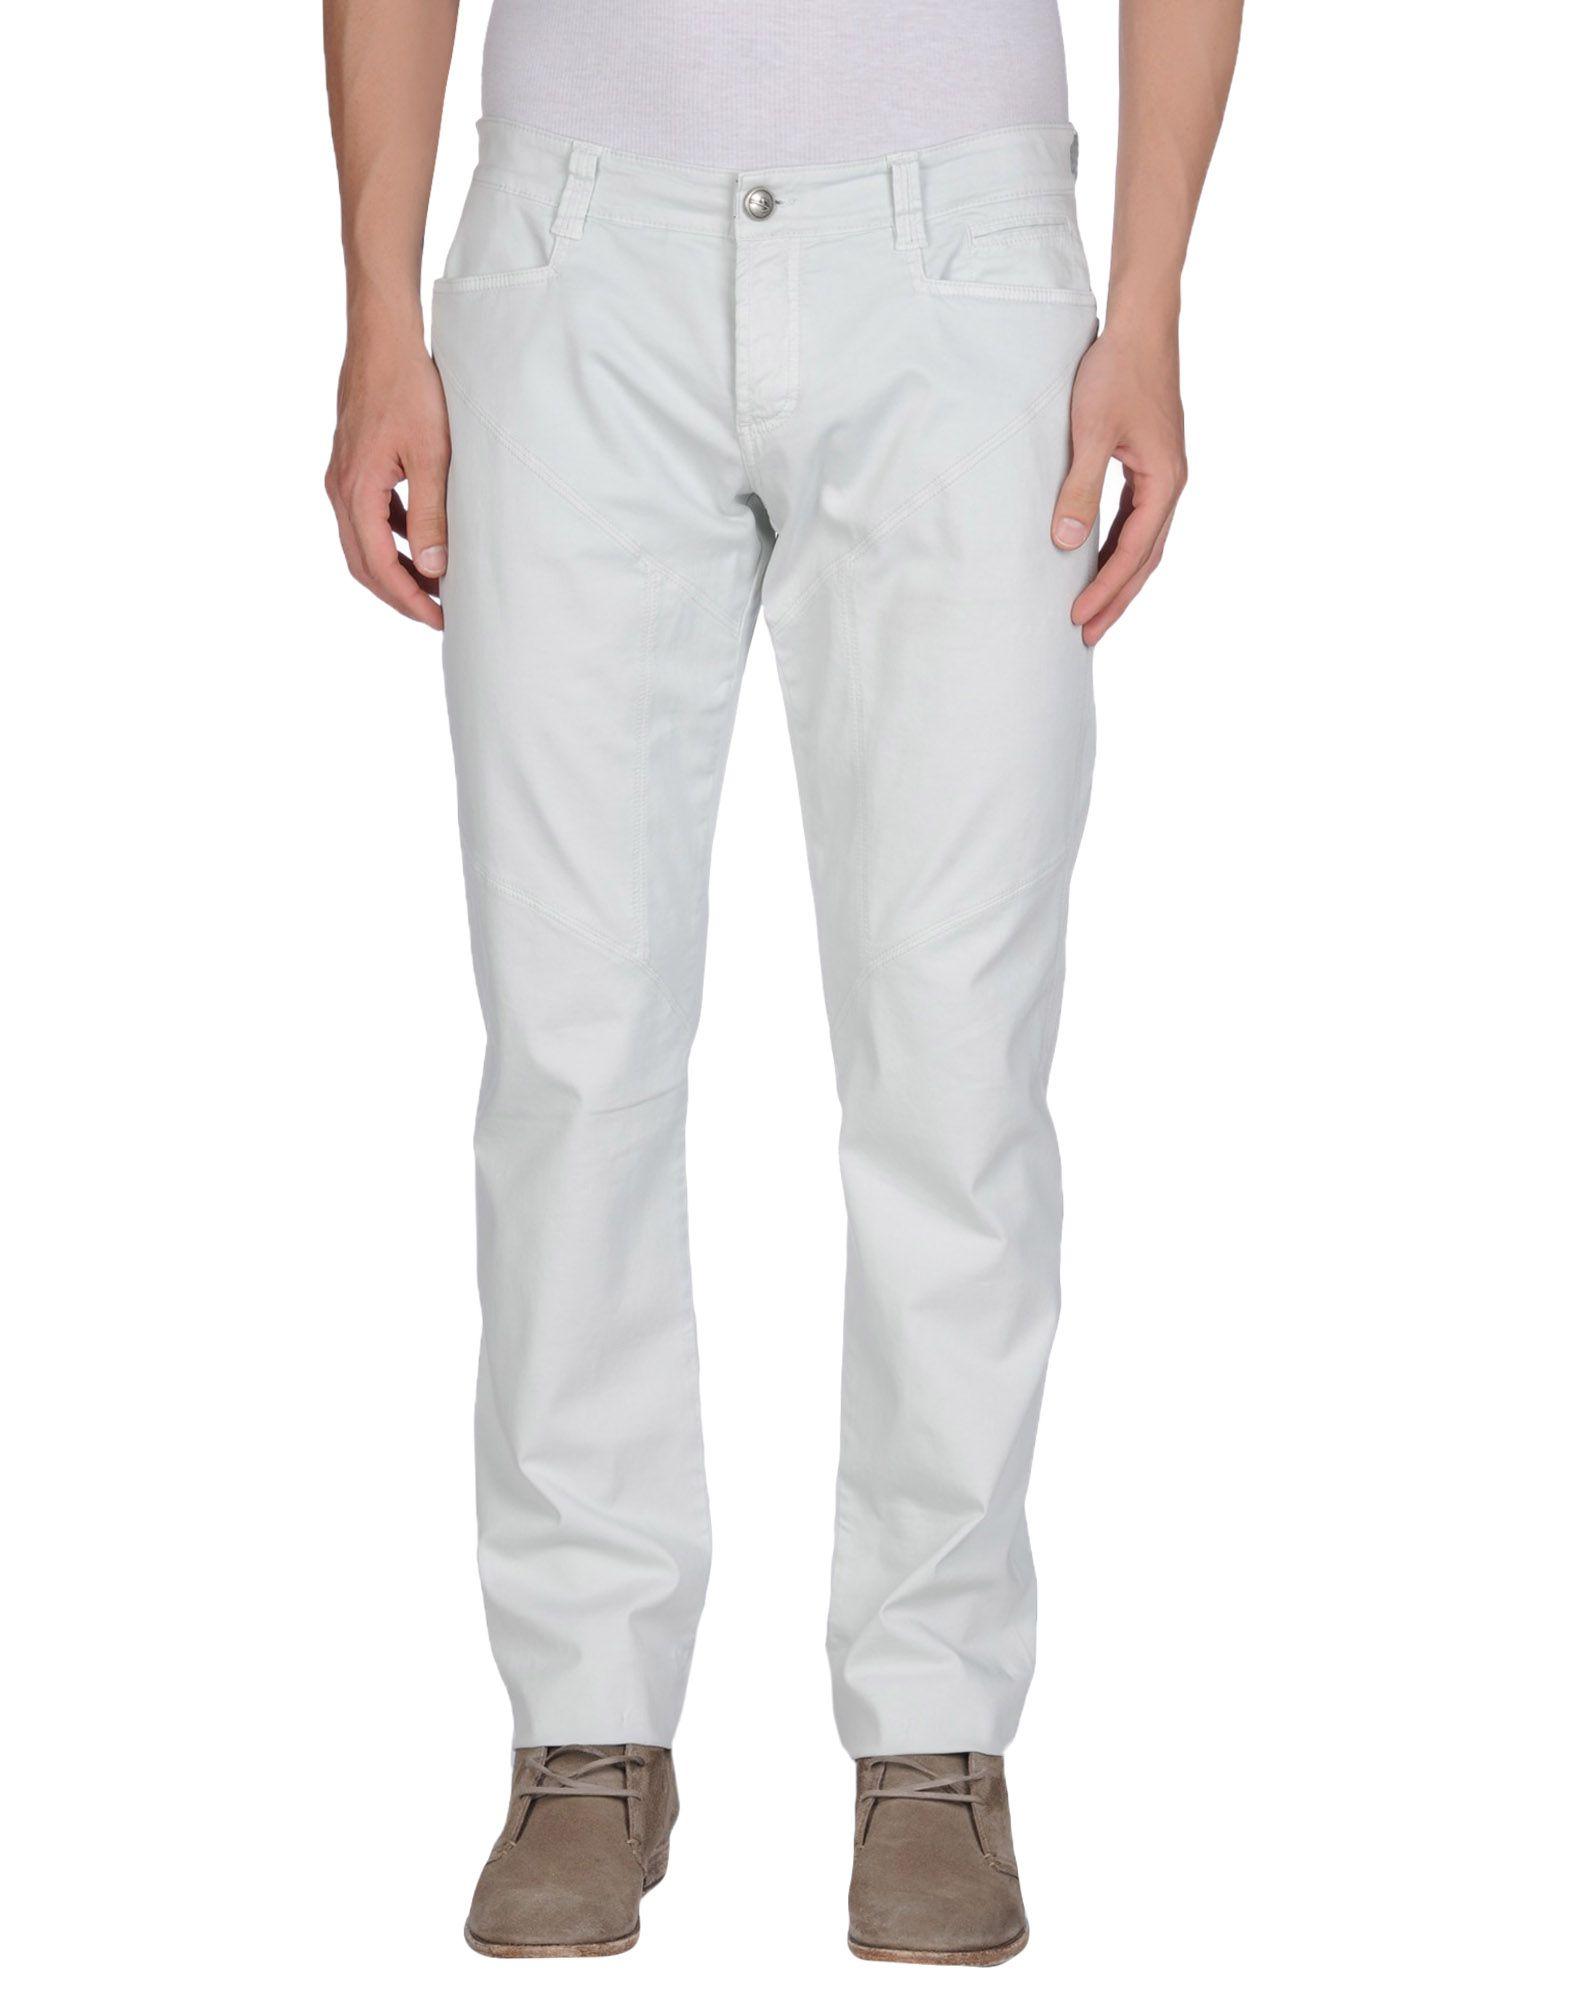 Pantalone 9.2 By Carlo  onna onna onna uomo - 36681415TE e8d